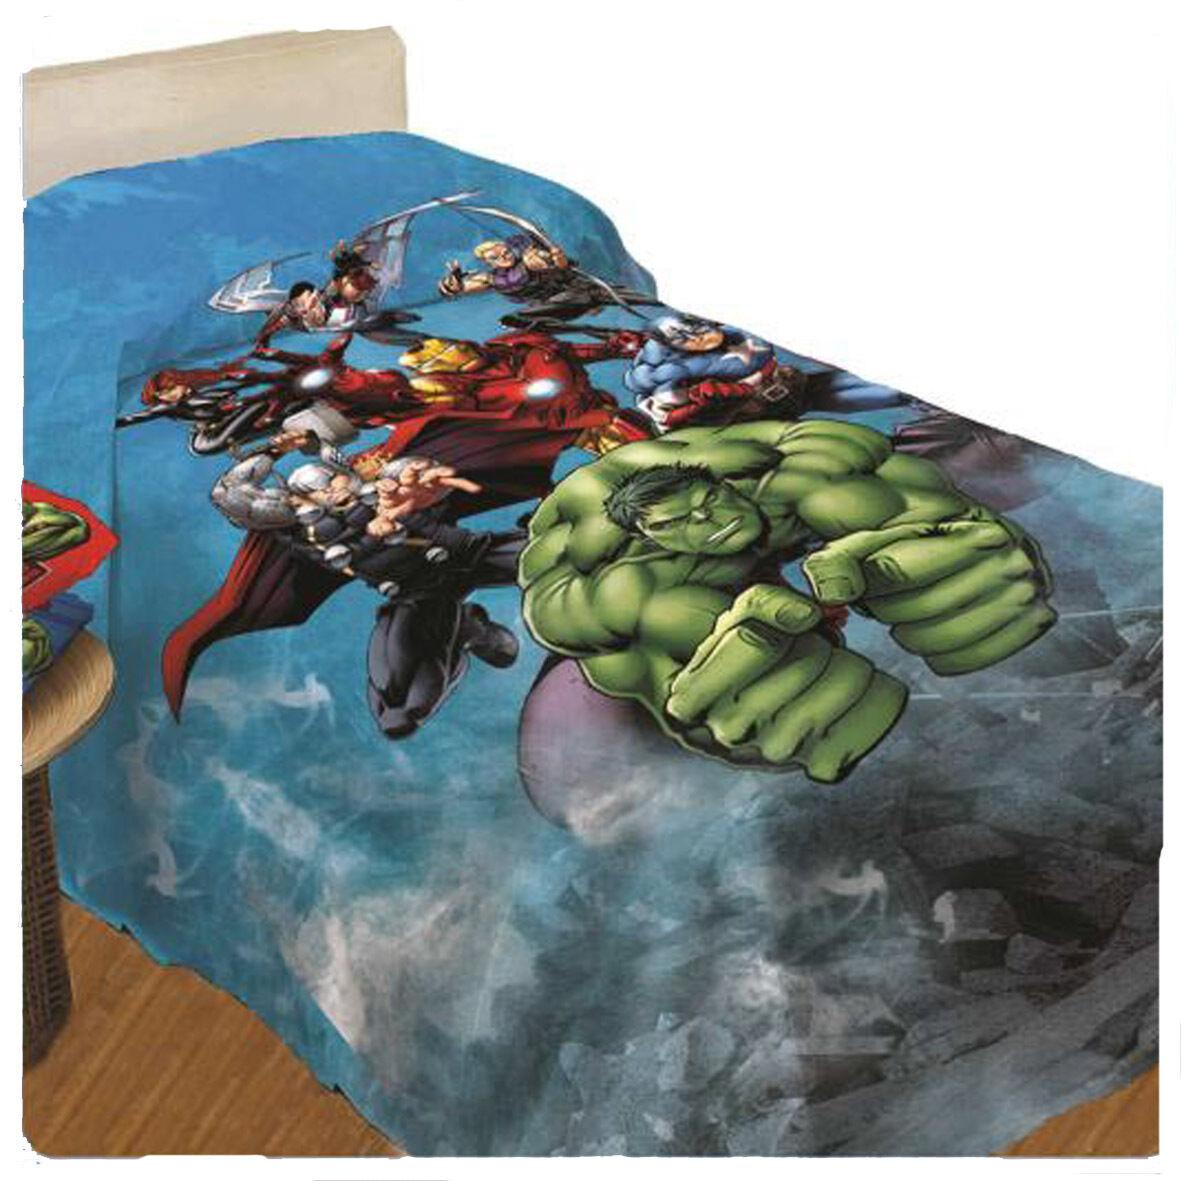 Avengers Tagesdecke Baumwolle Bedruckt 1 Quadrat 170x260 cm 2016/17